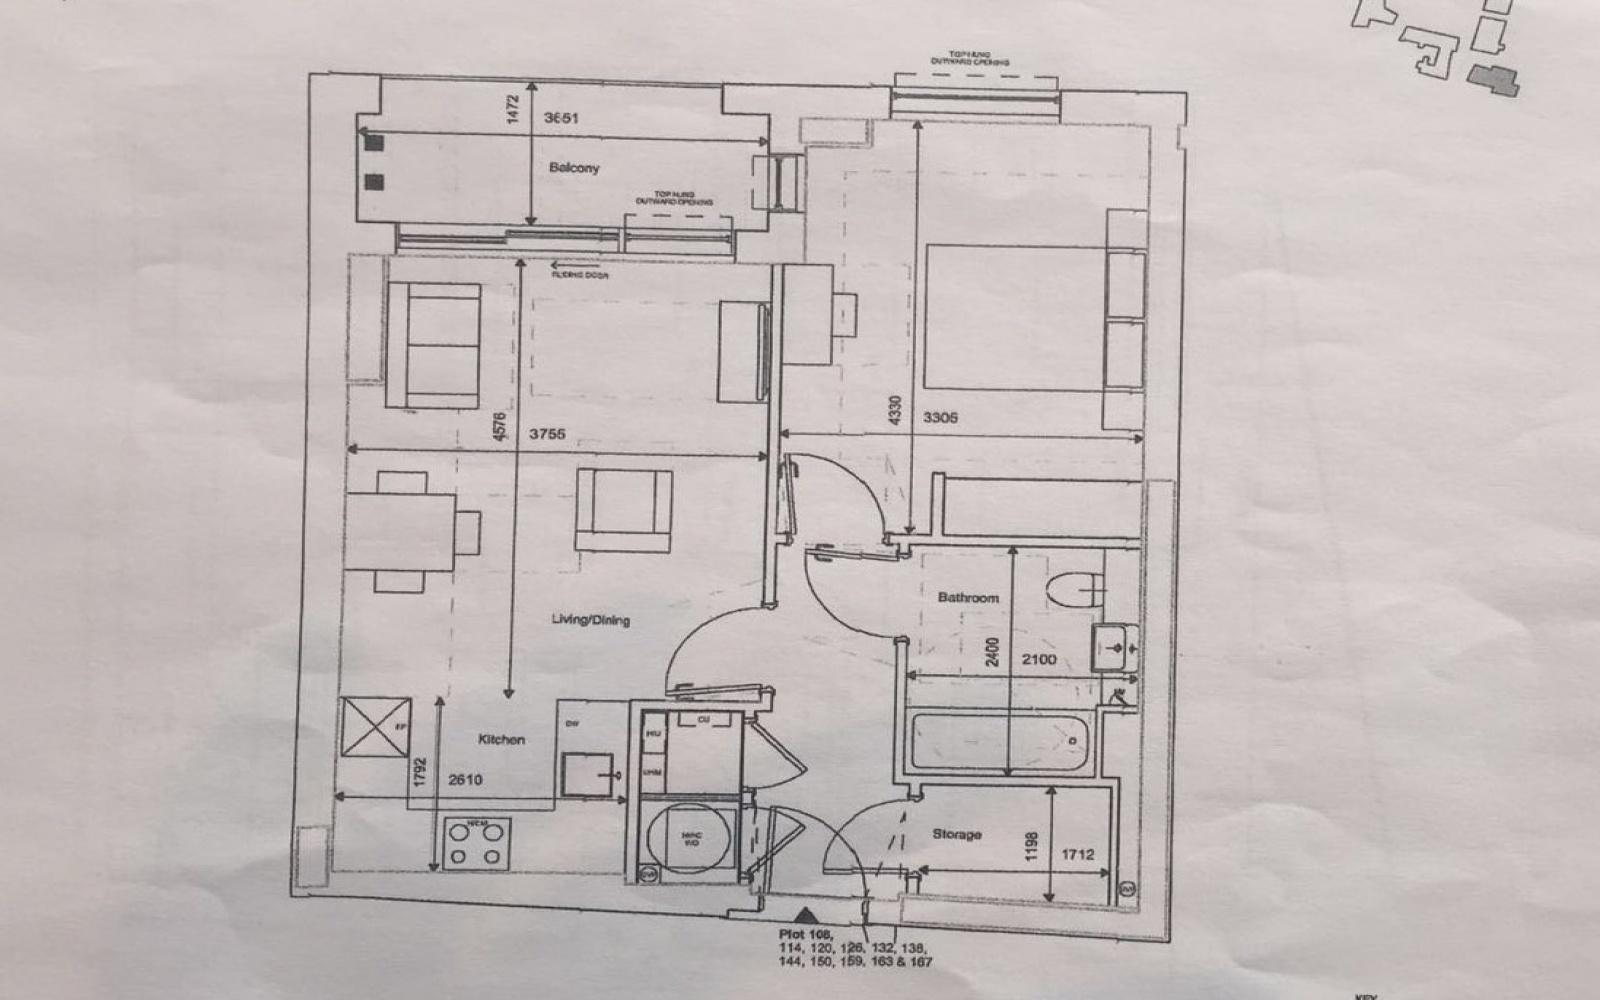 1 Bedrooms, Flat, For Sale, Wandsworth Road, 1 Bathrooms, Listing ID 1041, United Kingdom, Nine Elms,